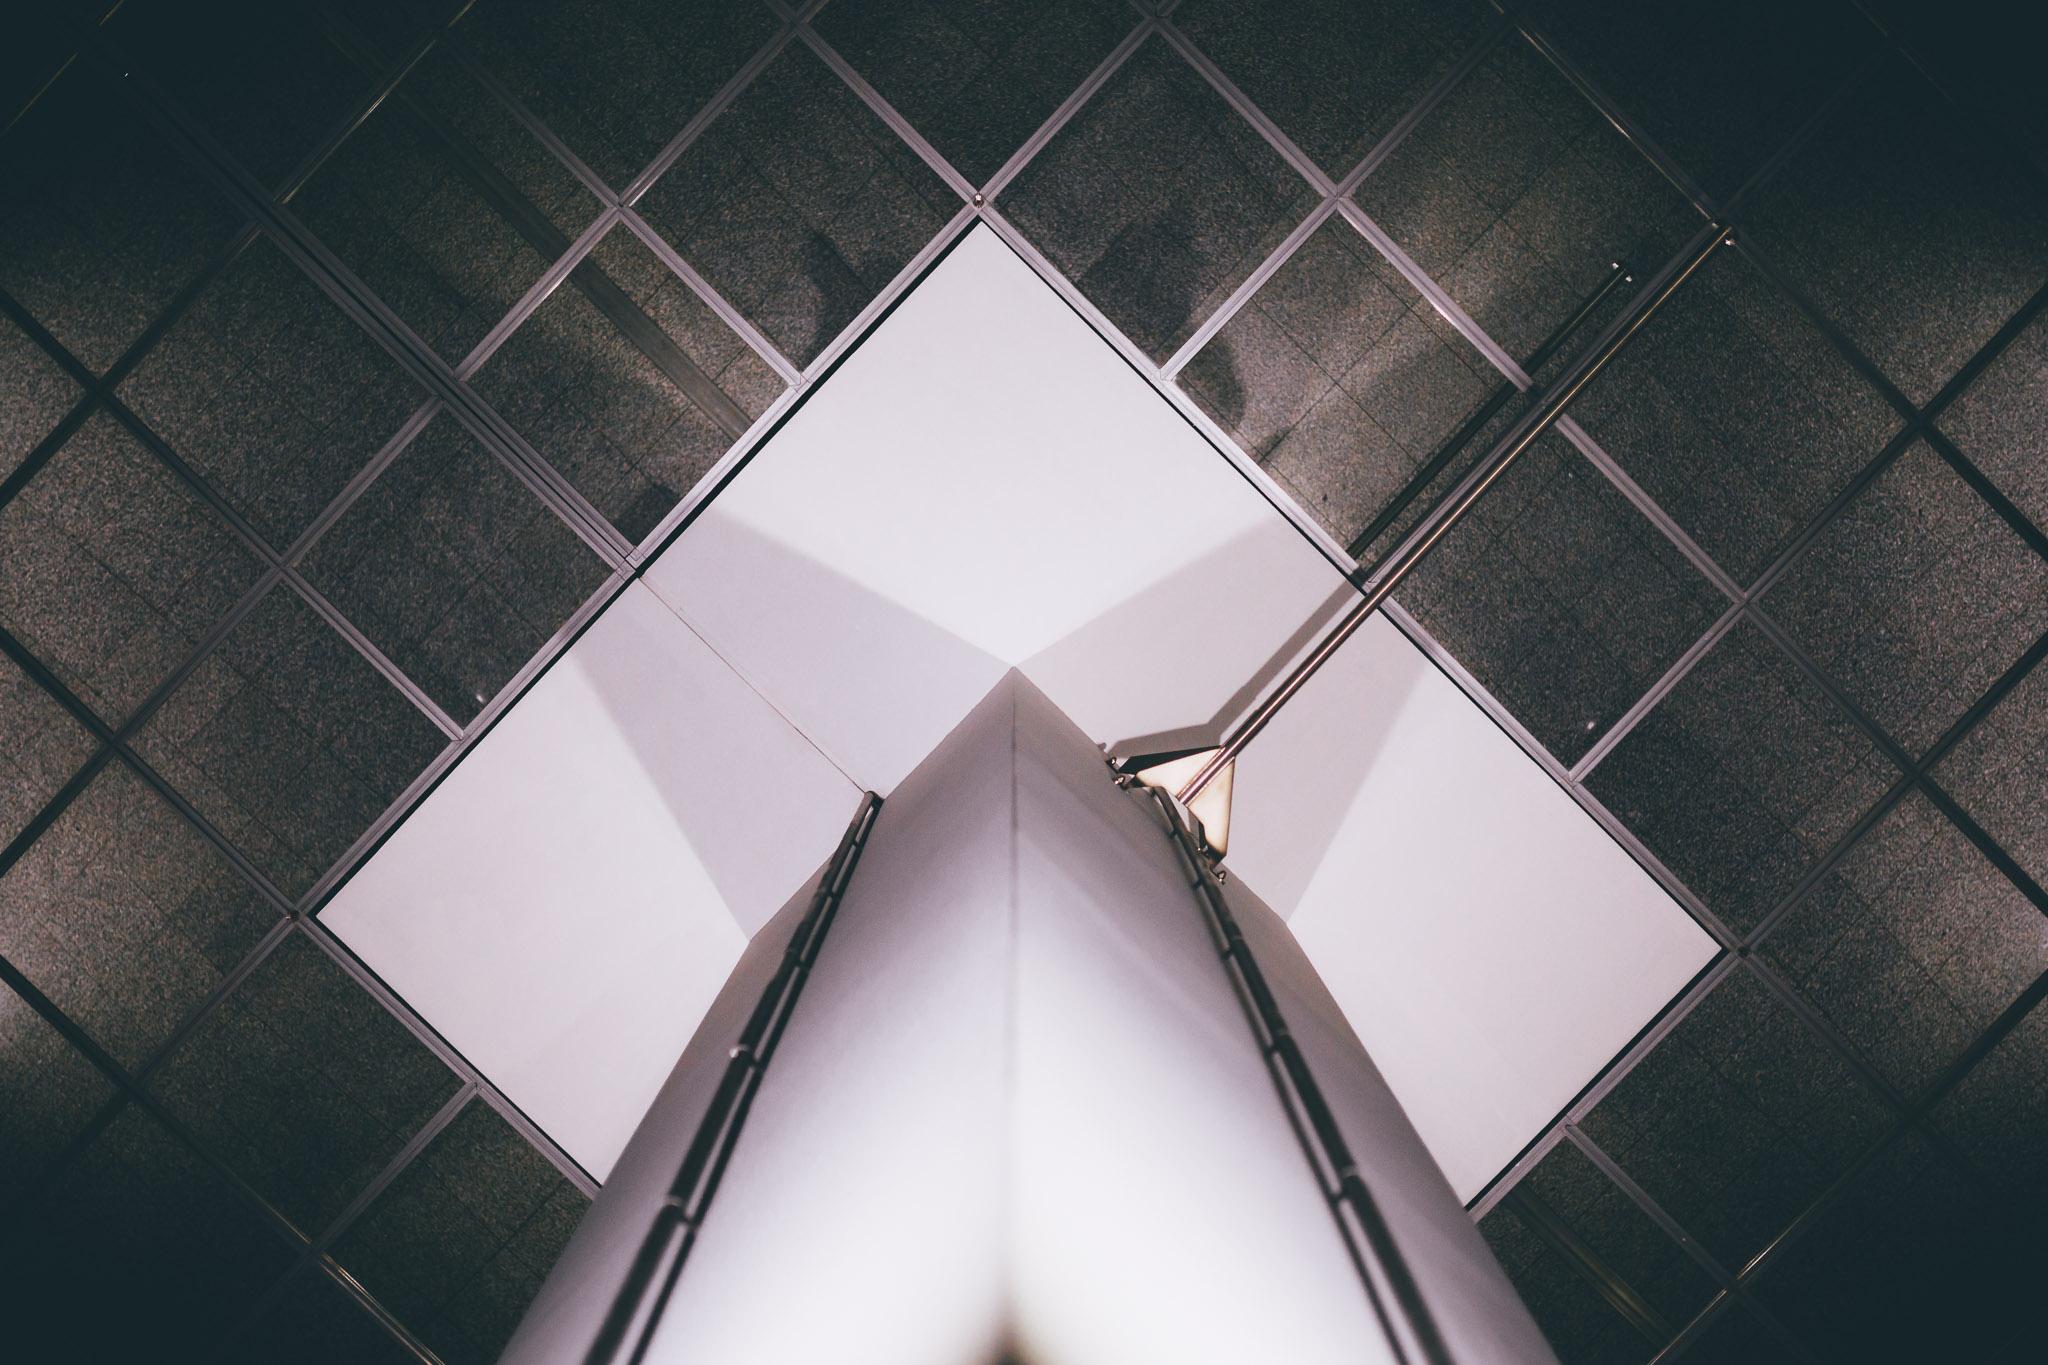 Flughafen Frankfurt Impression - Architektur